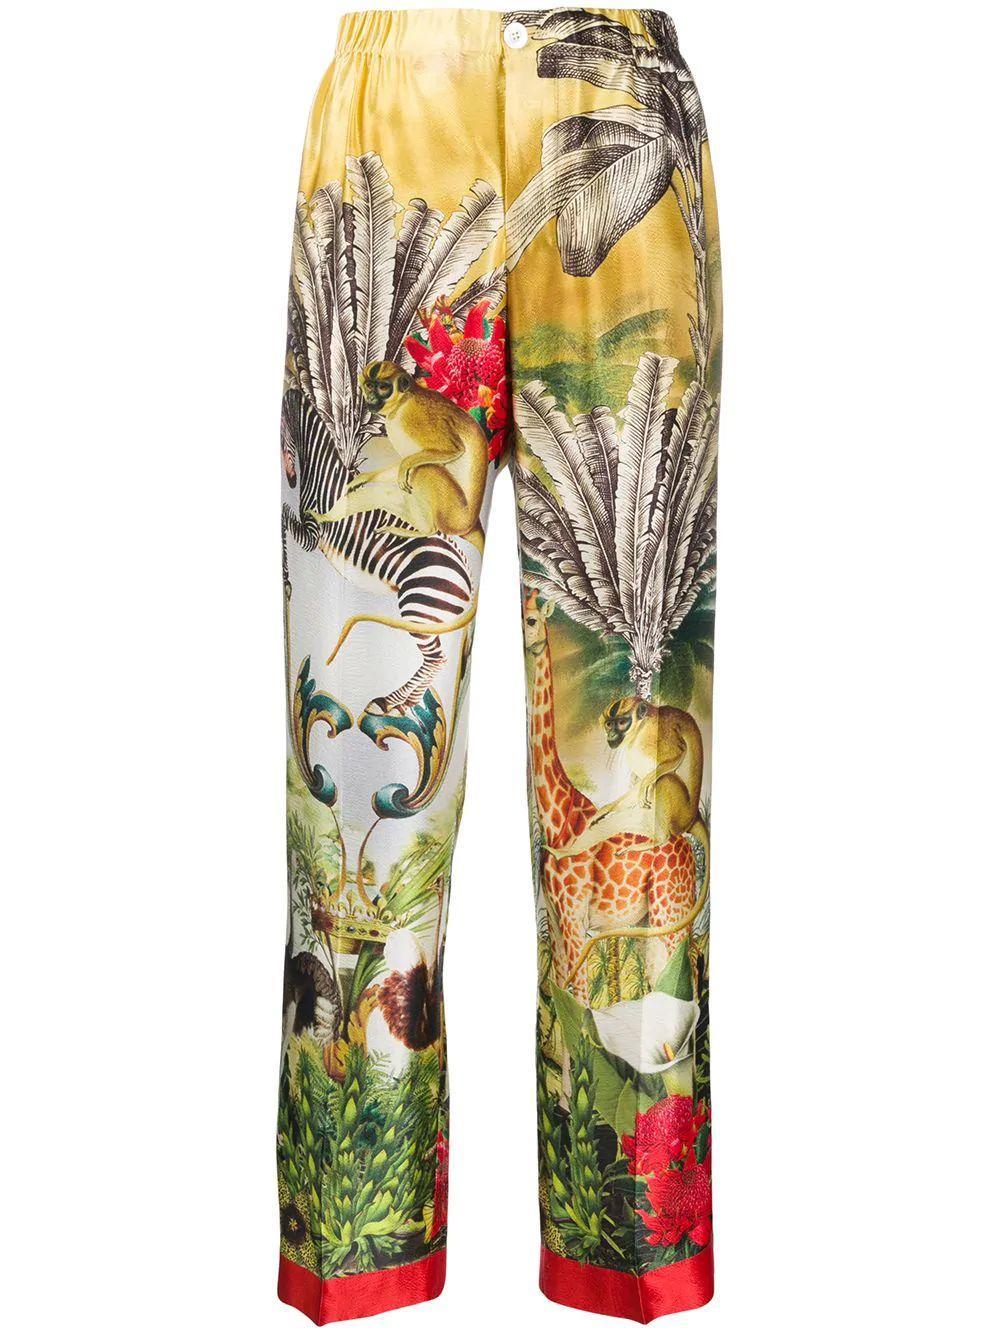 Giraffe And Zebra Printed Cuffed Hem Pant Item # PA002086-TE00412